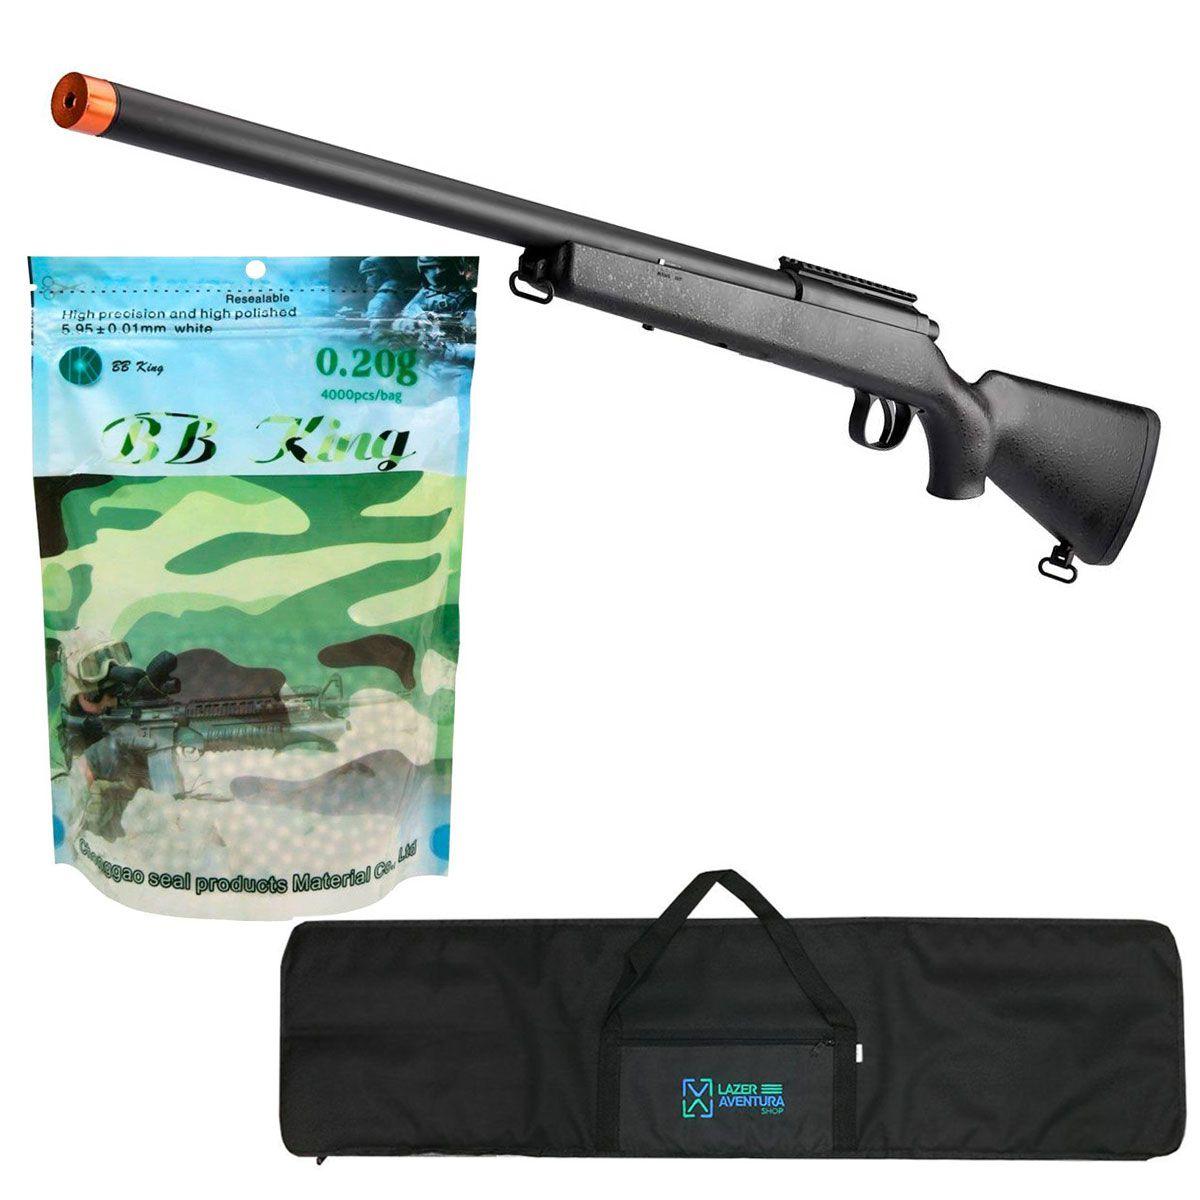 Kit Sniper Evo 6mm + BB King 0,20g + Capa Lazer e Aventura